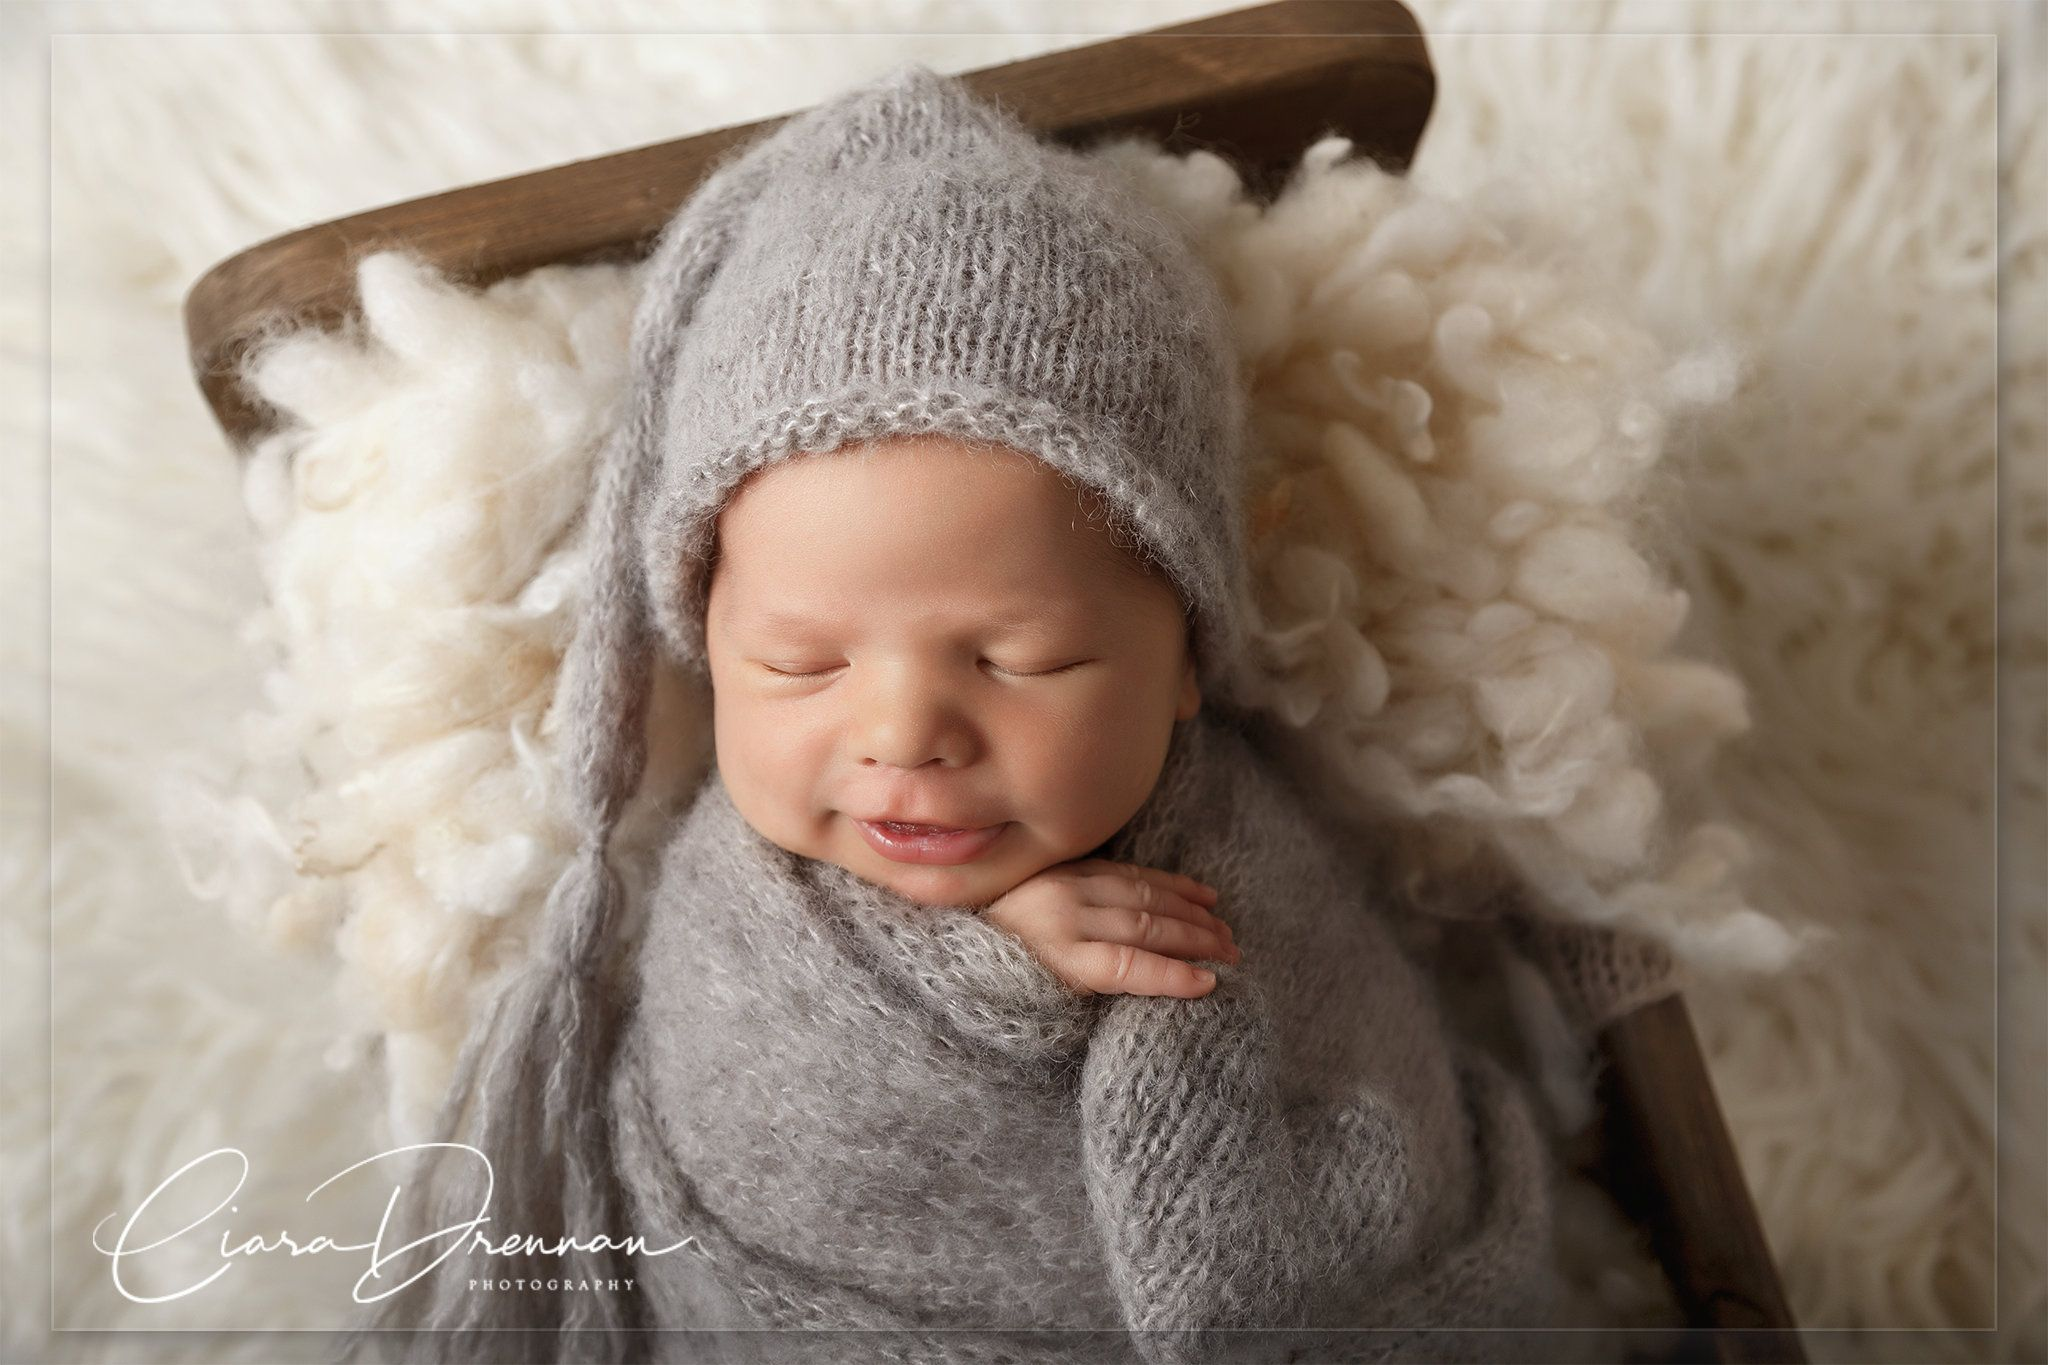 newborn bou props newborn girl beige set of romper and bonnet newborn set knit baby hat newborn romper newborn photo prop newborn hat